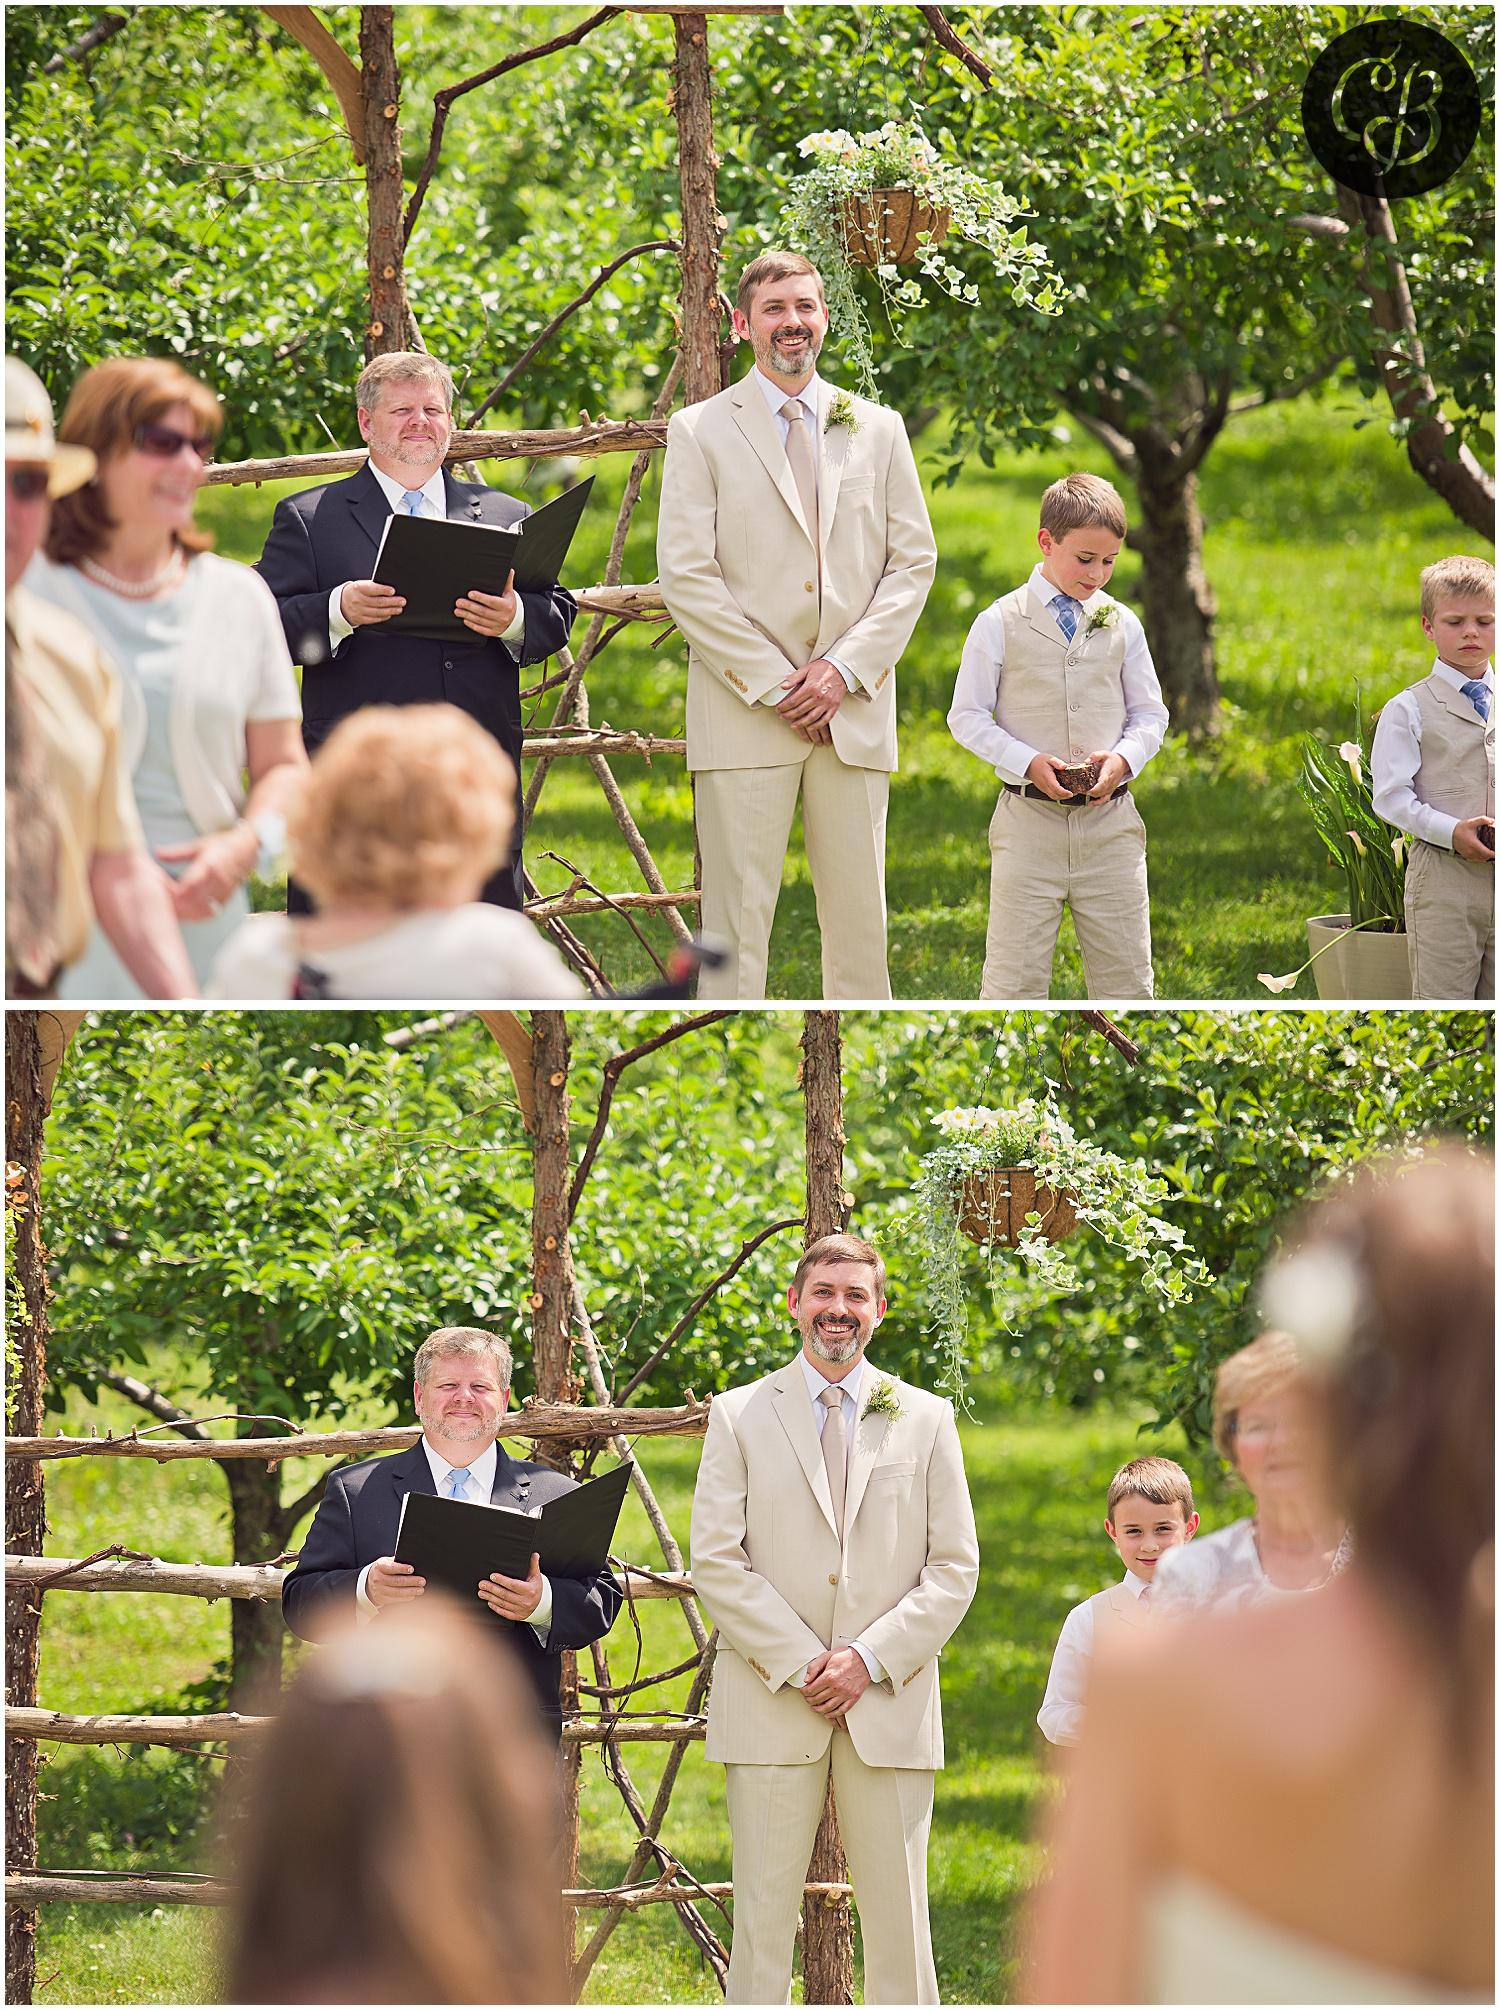 Sandhill-Crane-Winery-Wedding_0146.jpg